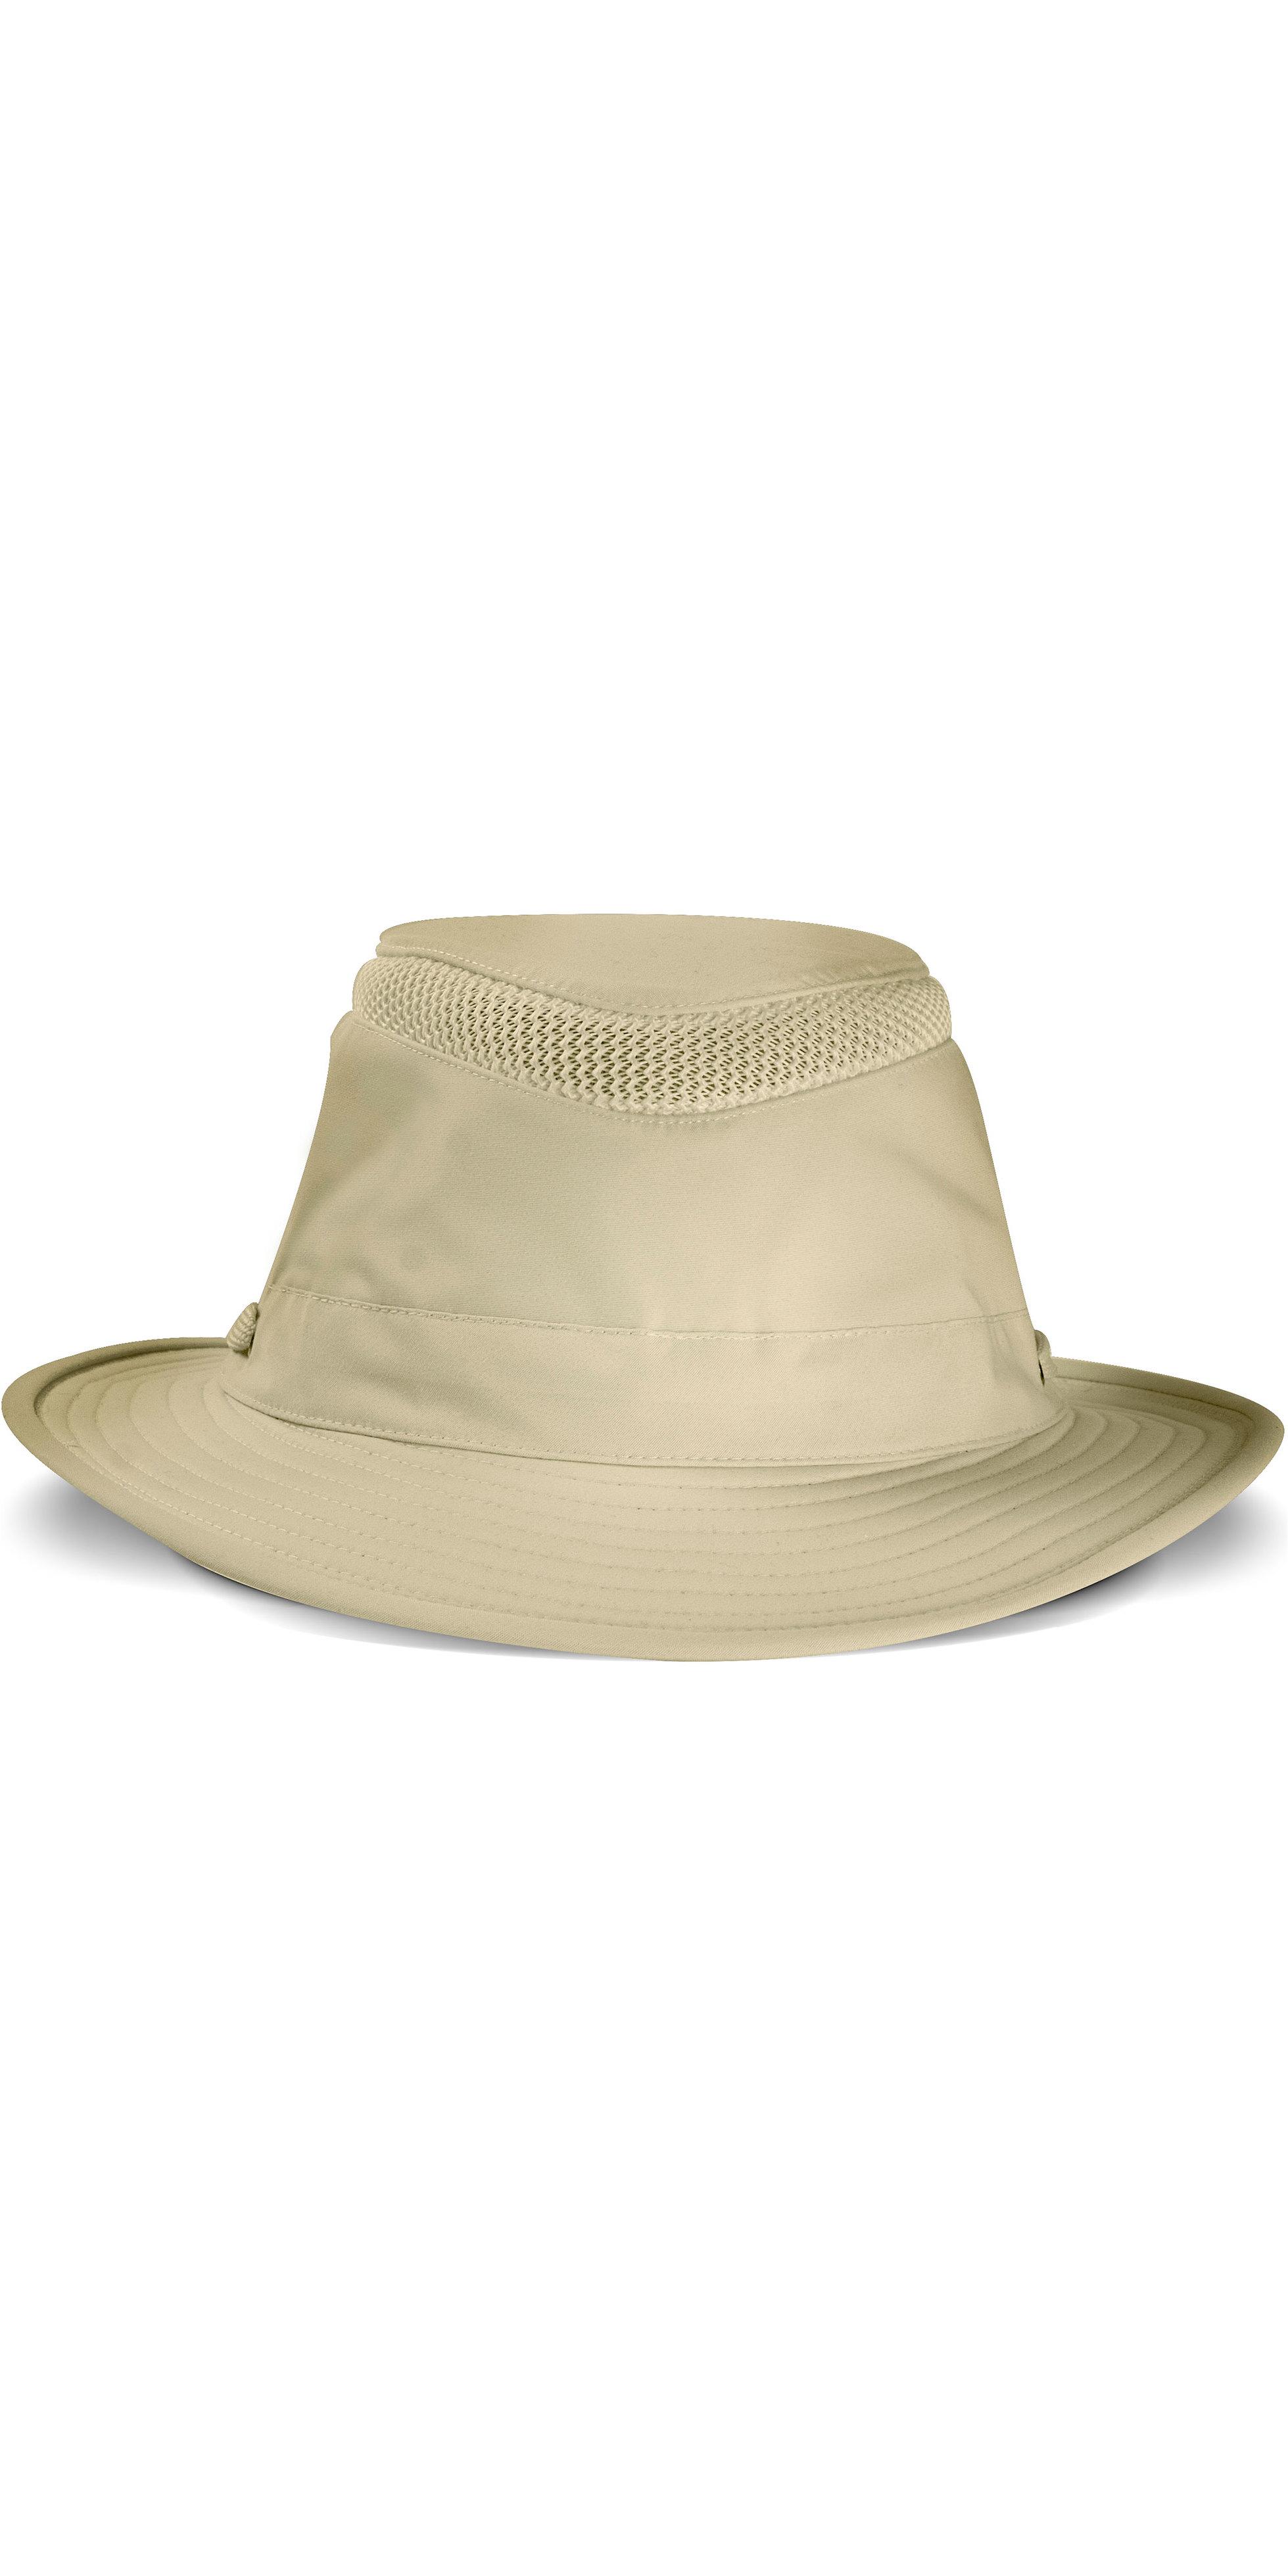 2019 Tilley Ltm5 Airflo Brimmed Hat Khaki - Ltm5 - Technical Hats ... 15e1b269e60c